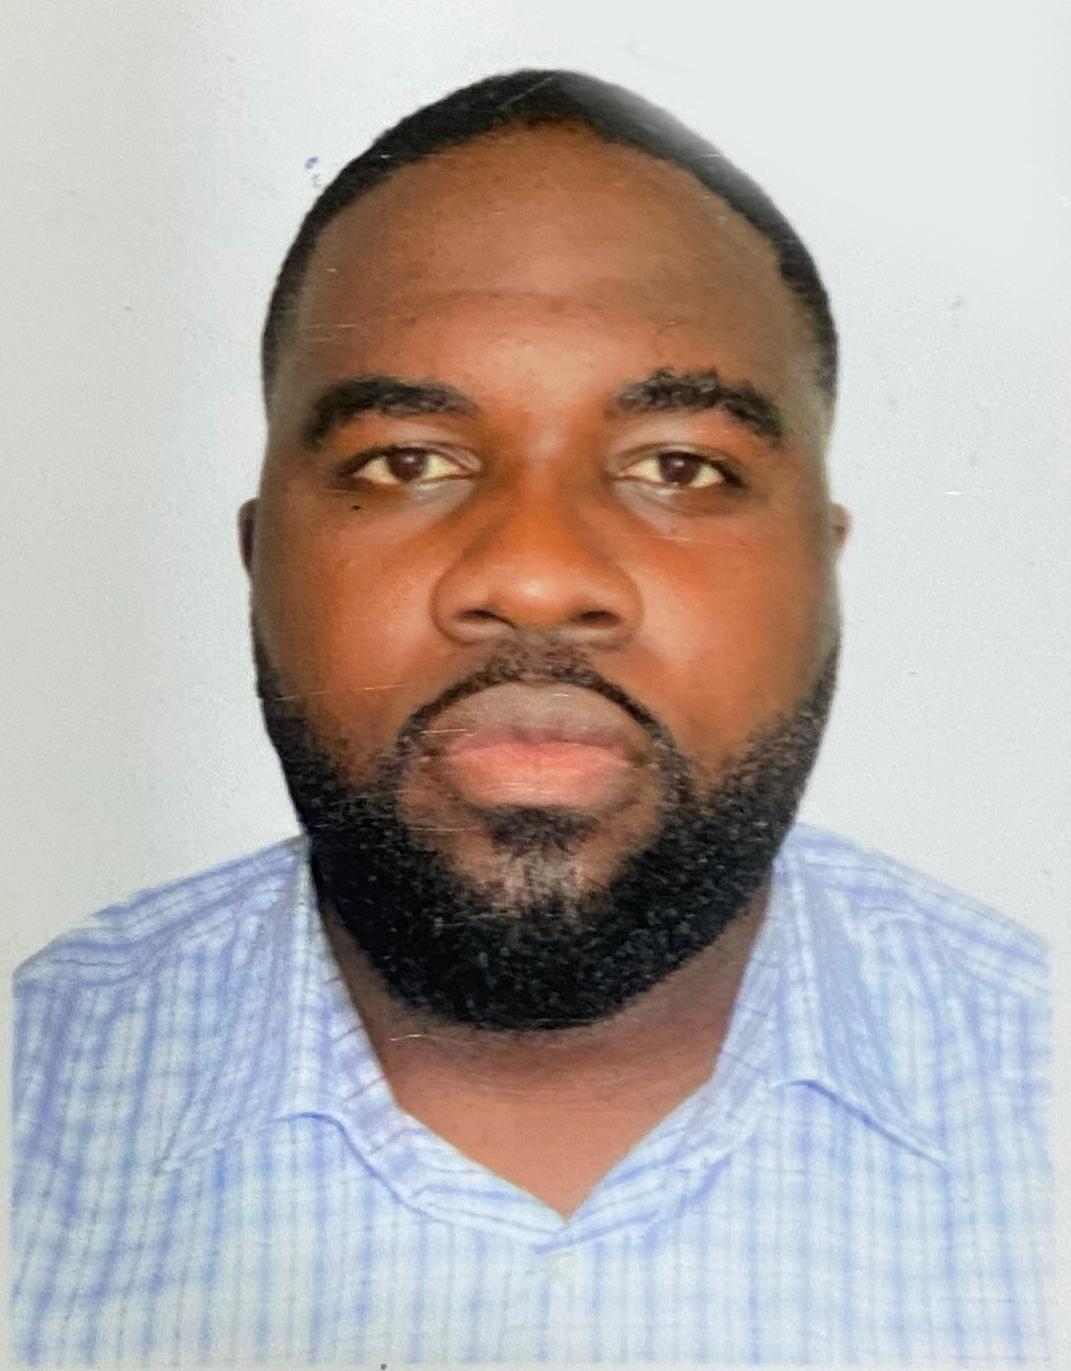 Paul Obasogie Firstlincoln Technologies Developer